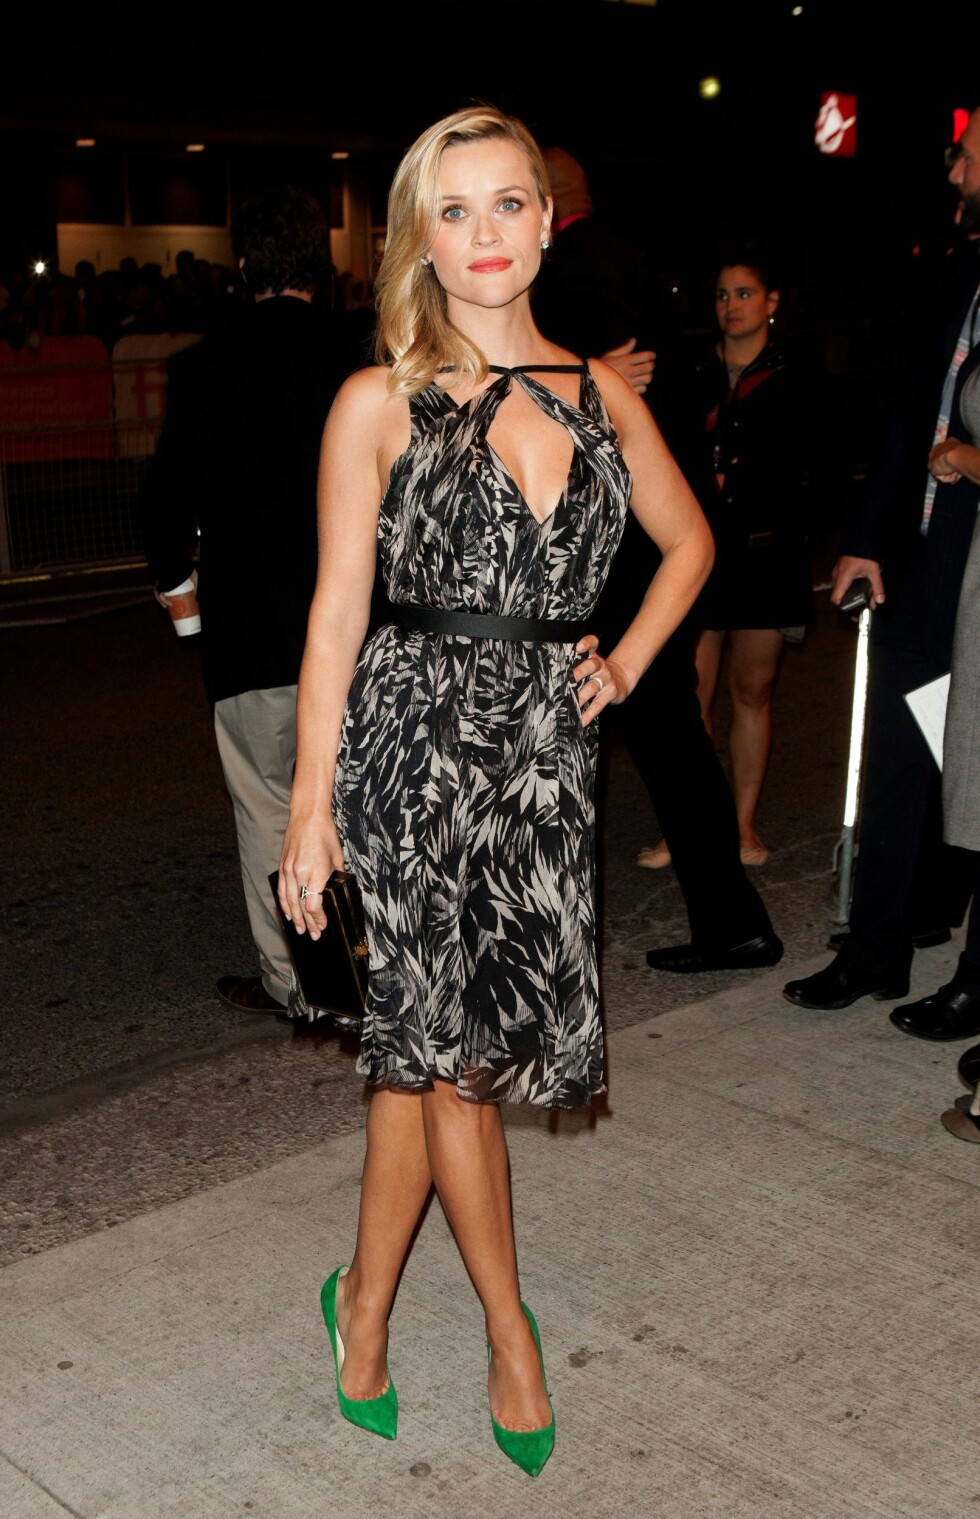 «Lovlig blond»-stjernen kombinerte den mønstrede kjolen fra Jason Wu med knallgrønne Jimmy Choo-pumps. Den lille boksclutchen er også fra Jason Wu.  Foto: All Over Press